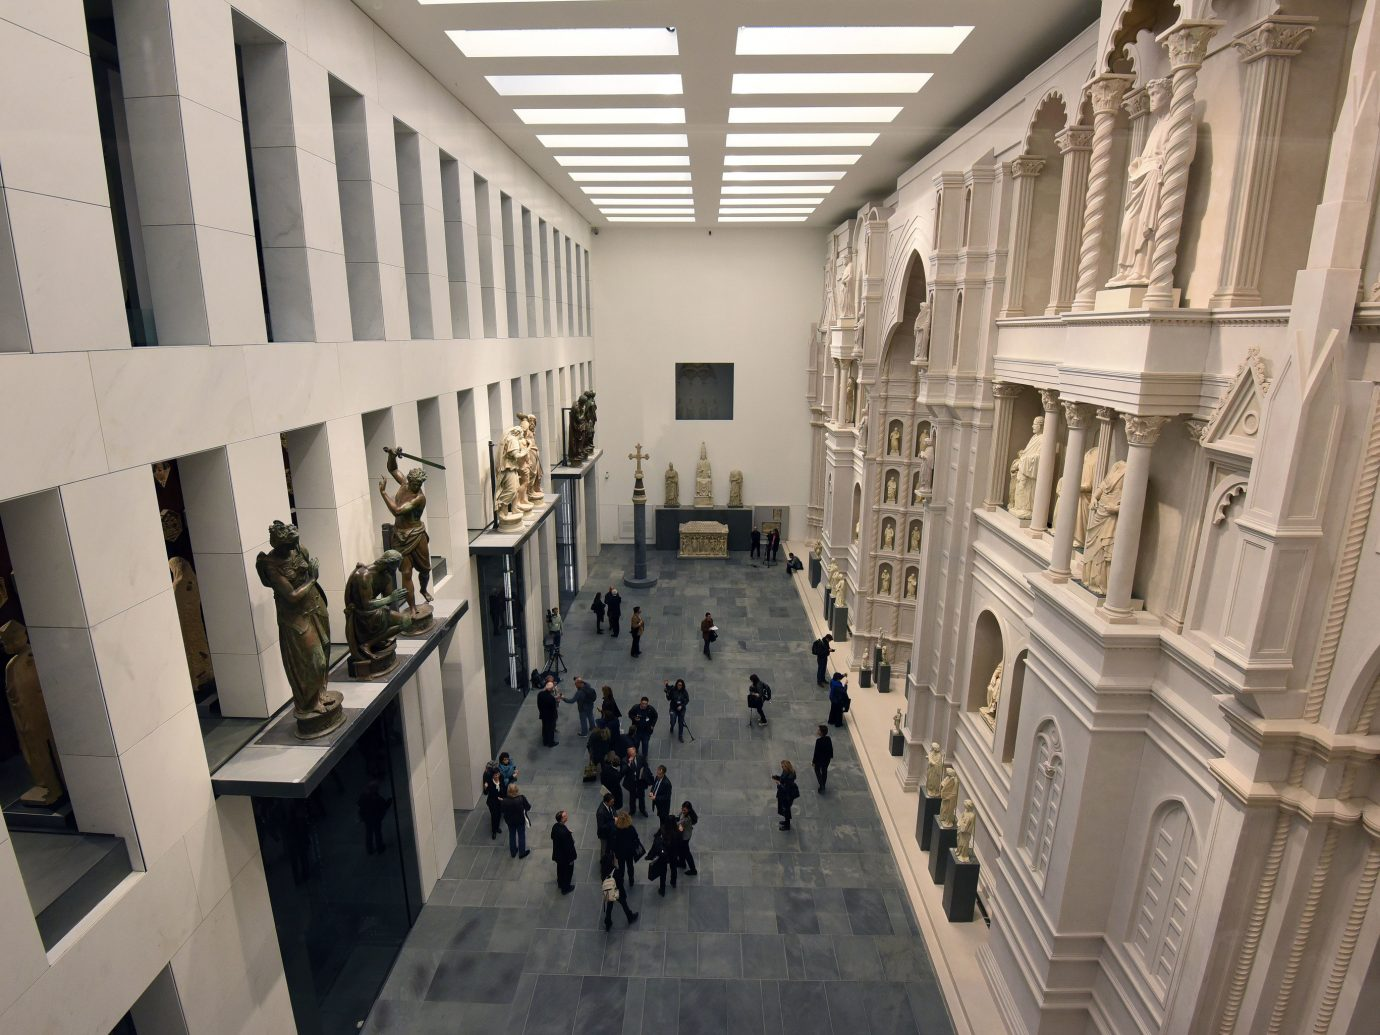 Arts + Culture indoor building Architecture tourist attraction museum interior design hall art gallery colonnade